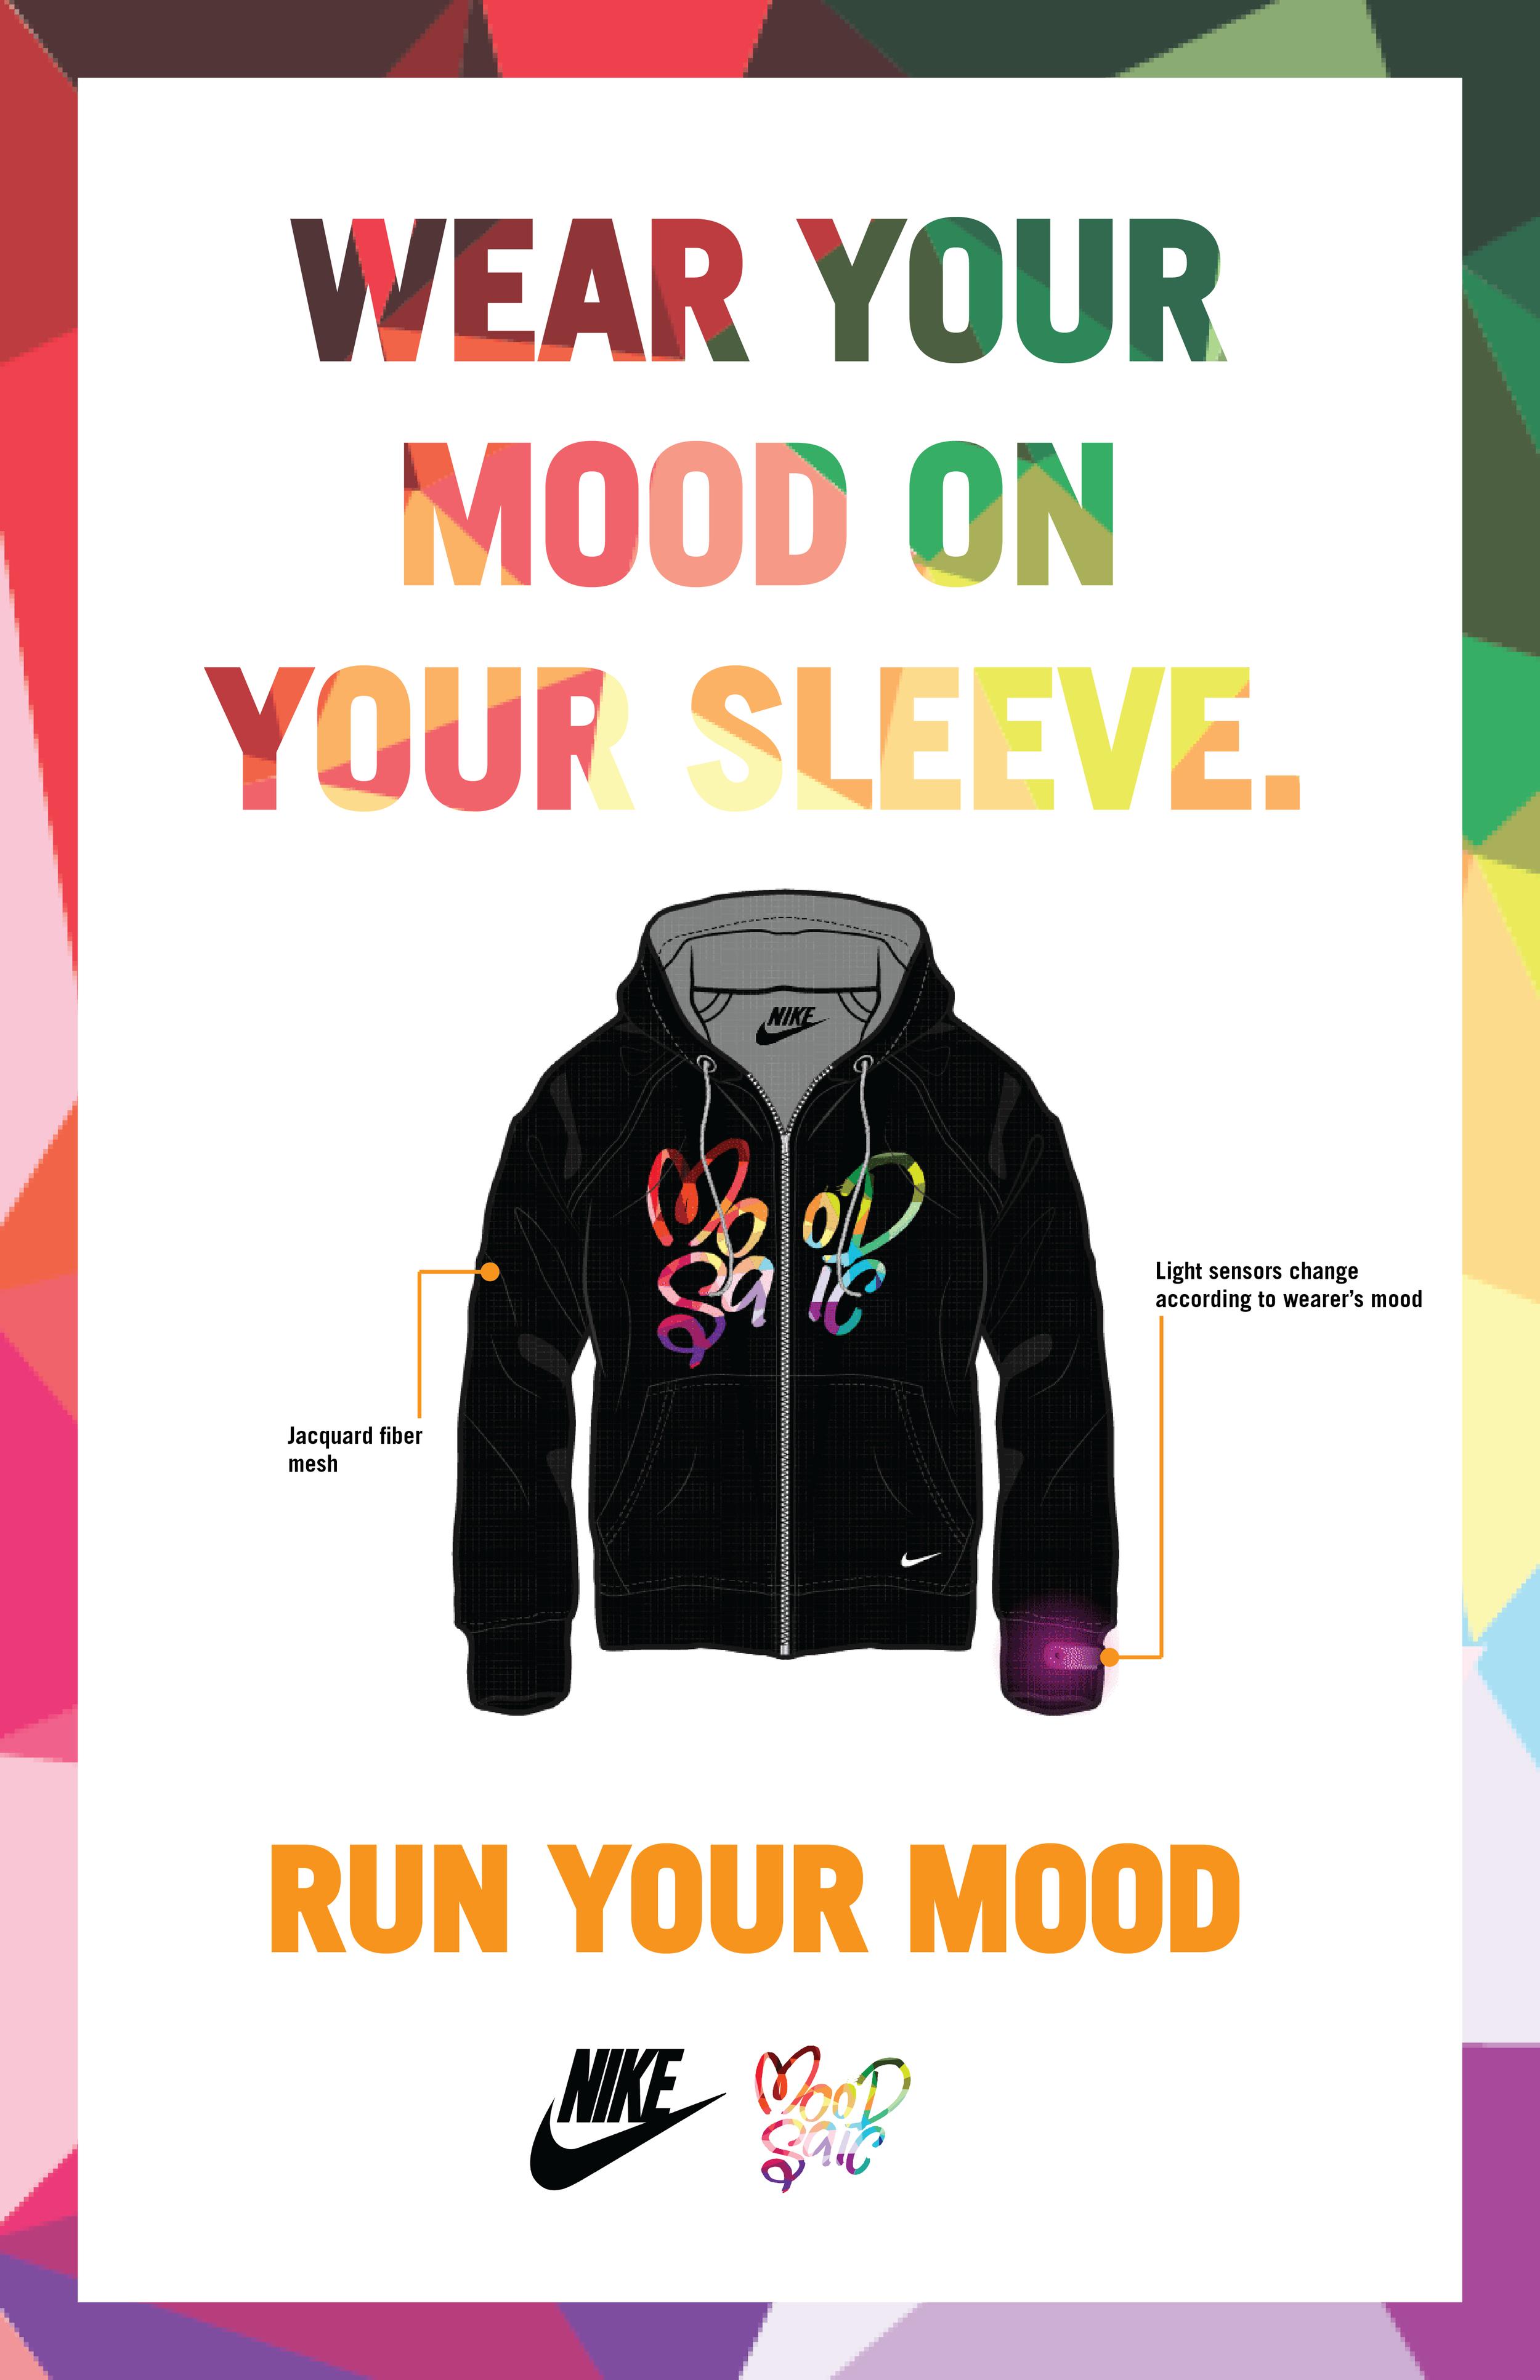 Nike_ad redone_HOODIE-01.png